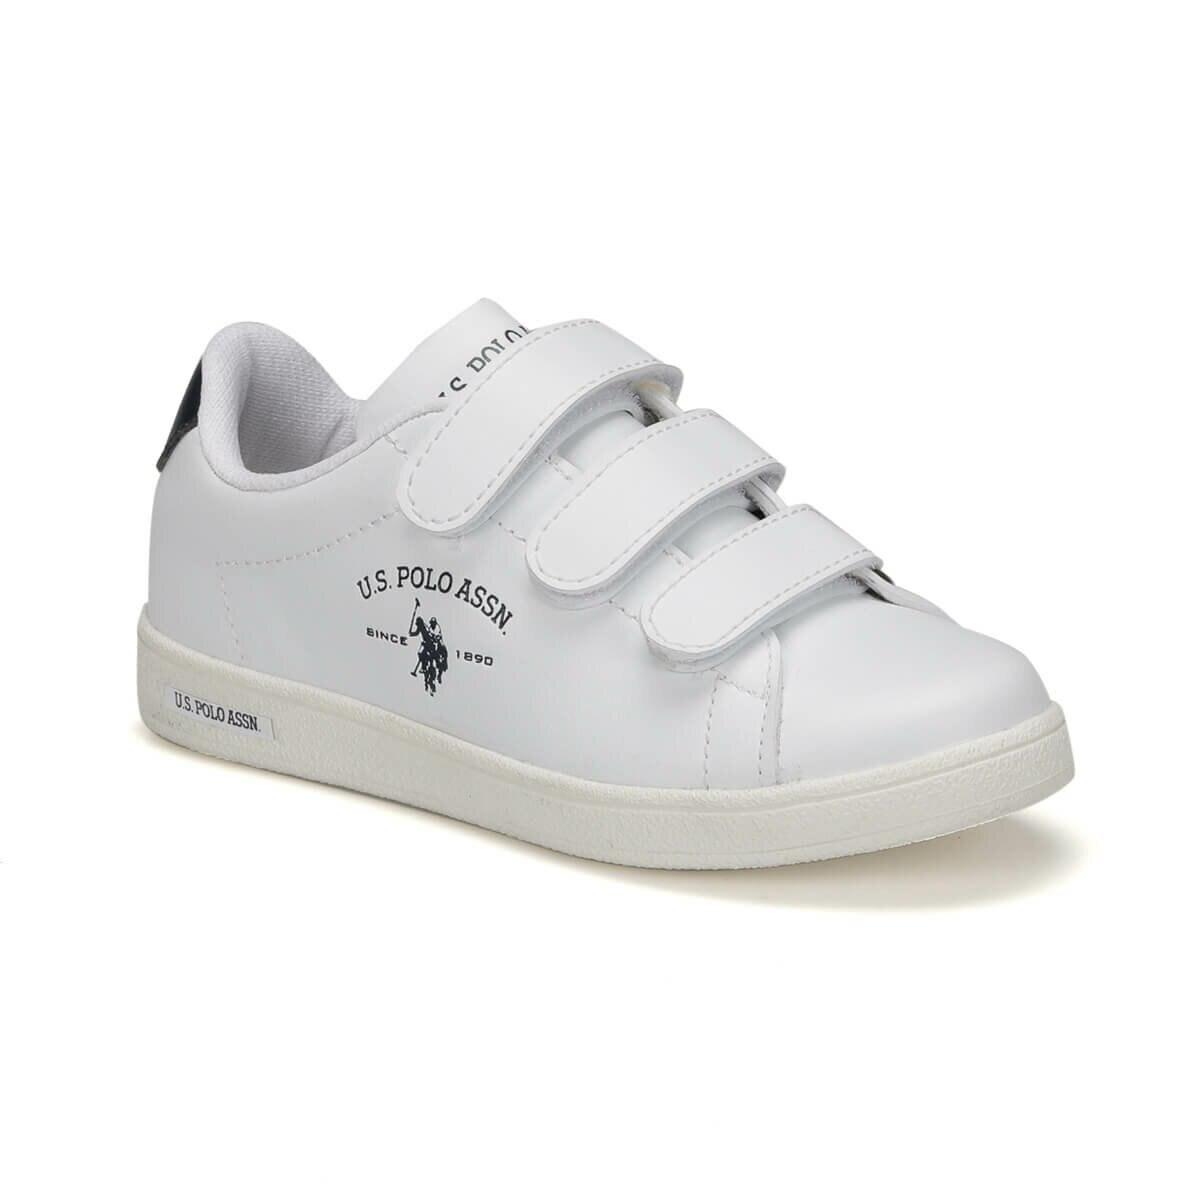 FLO SINGER 9PR White Male Child Sneaker Shoes U.S. POLO ASSN.